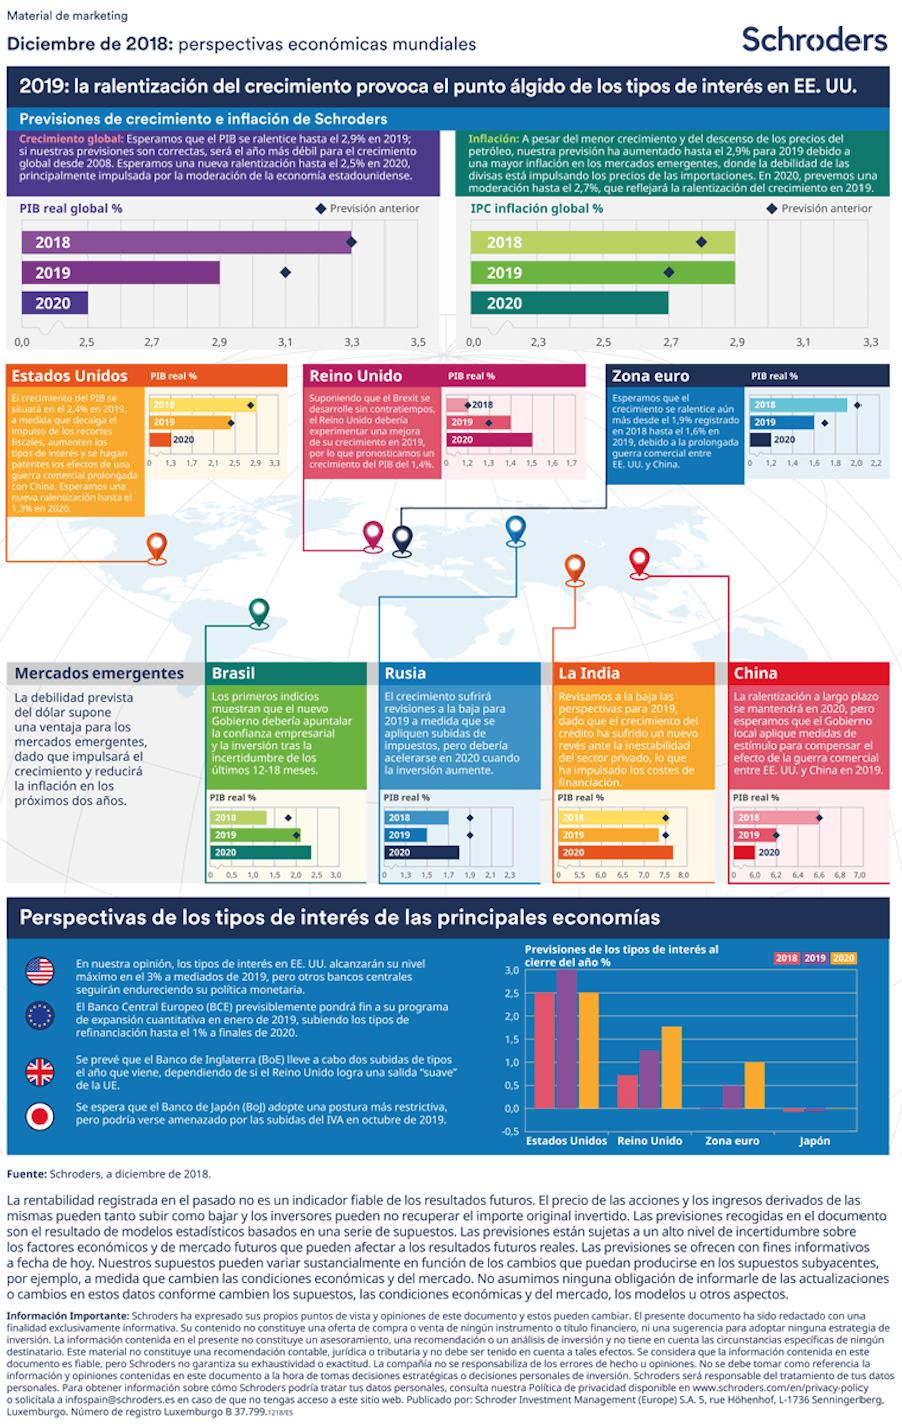 Infografia Schroders